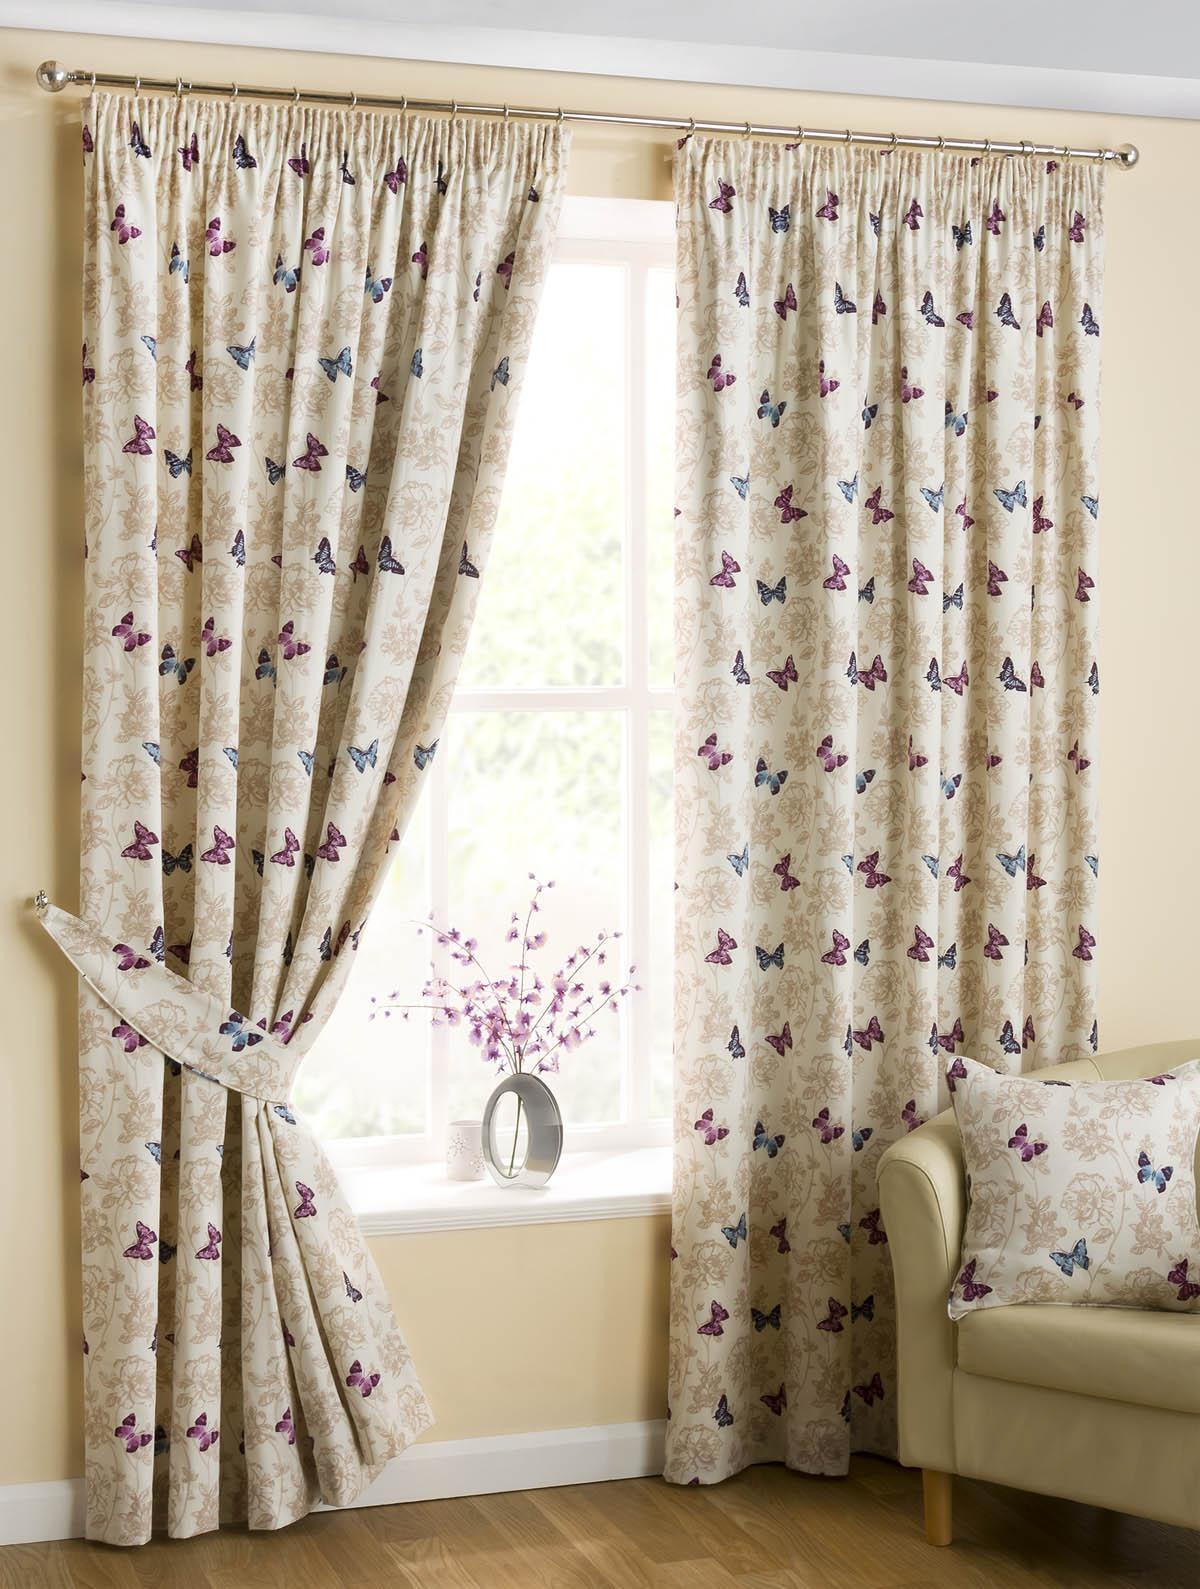 Fascinating Art Do Pink Drapes Sweet Purpose Crushed Sheer Regarding Mauve Sheer Curtains (View 15 of 25)